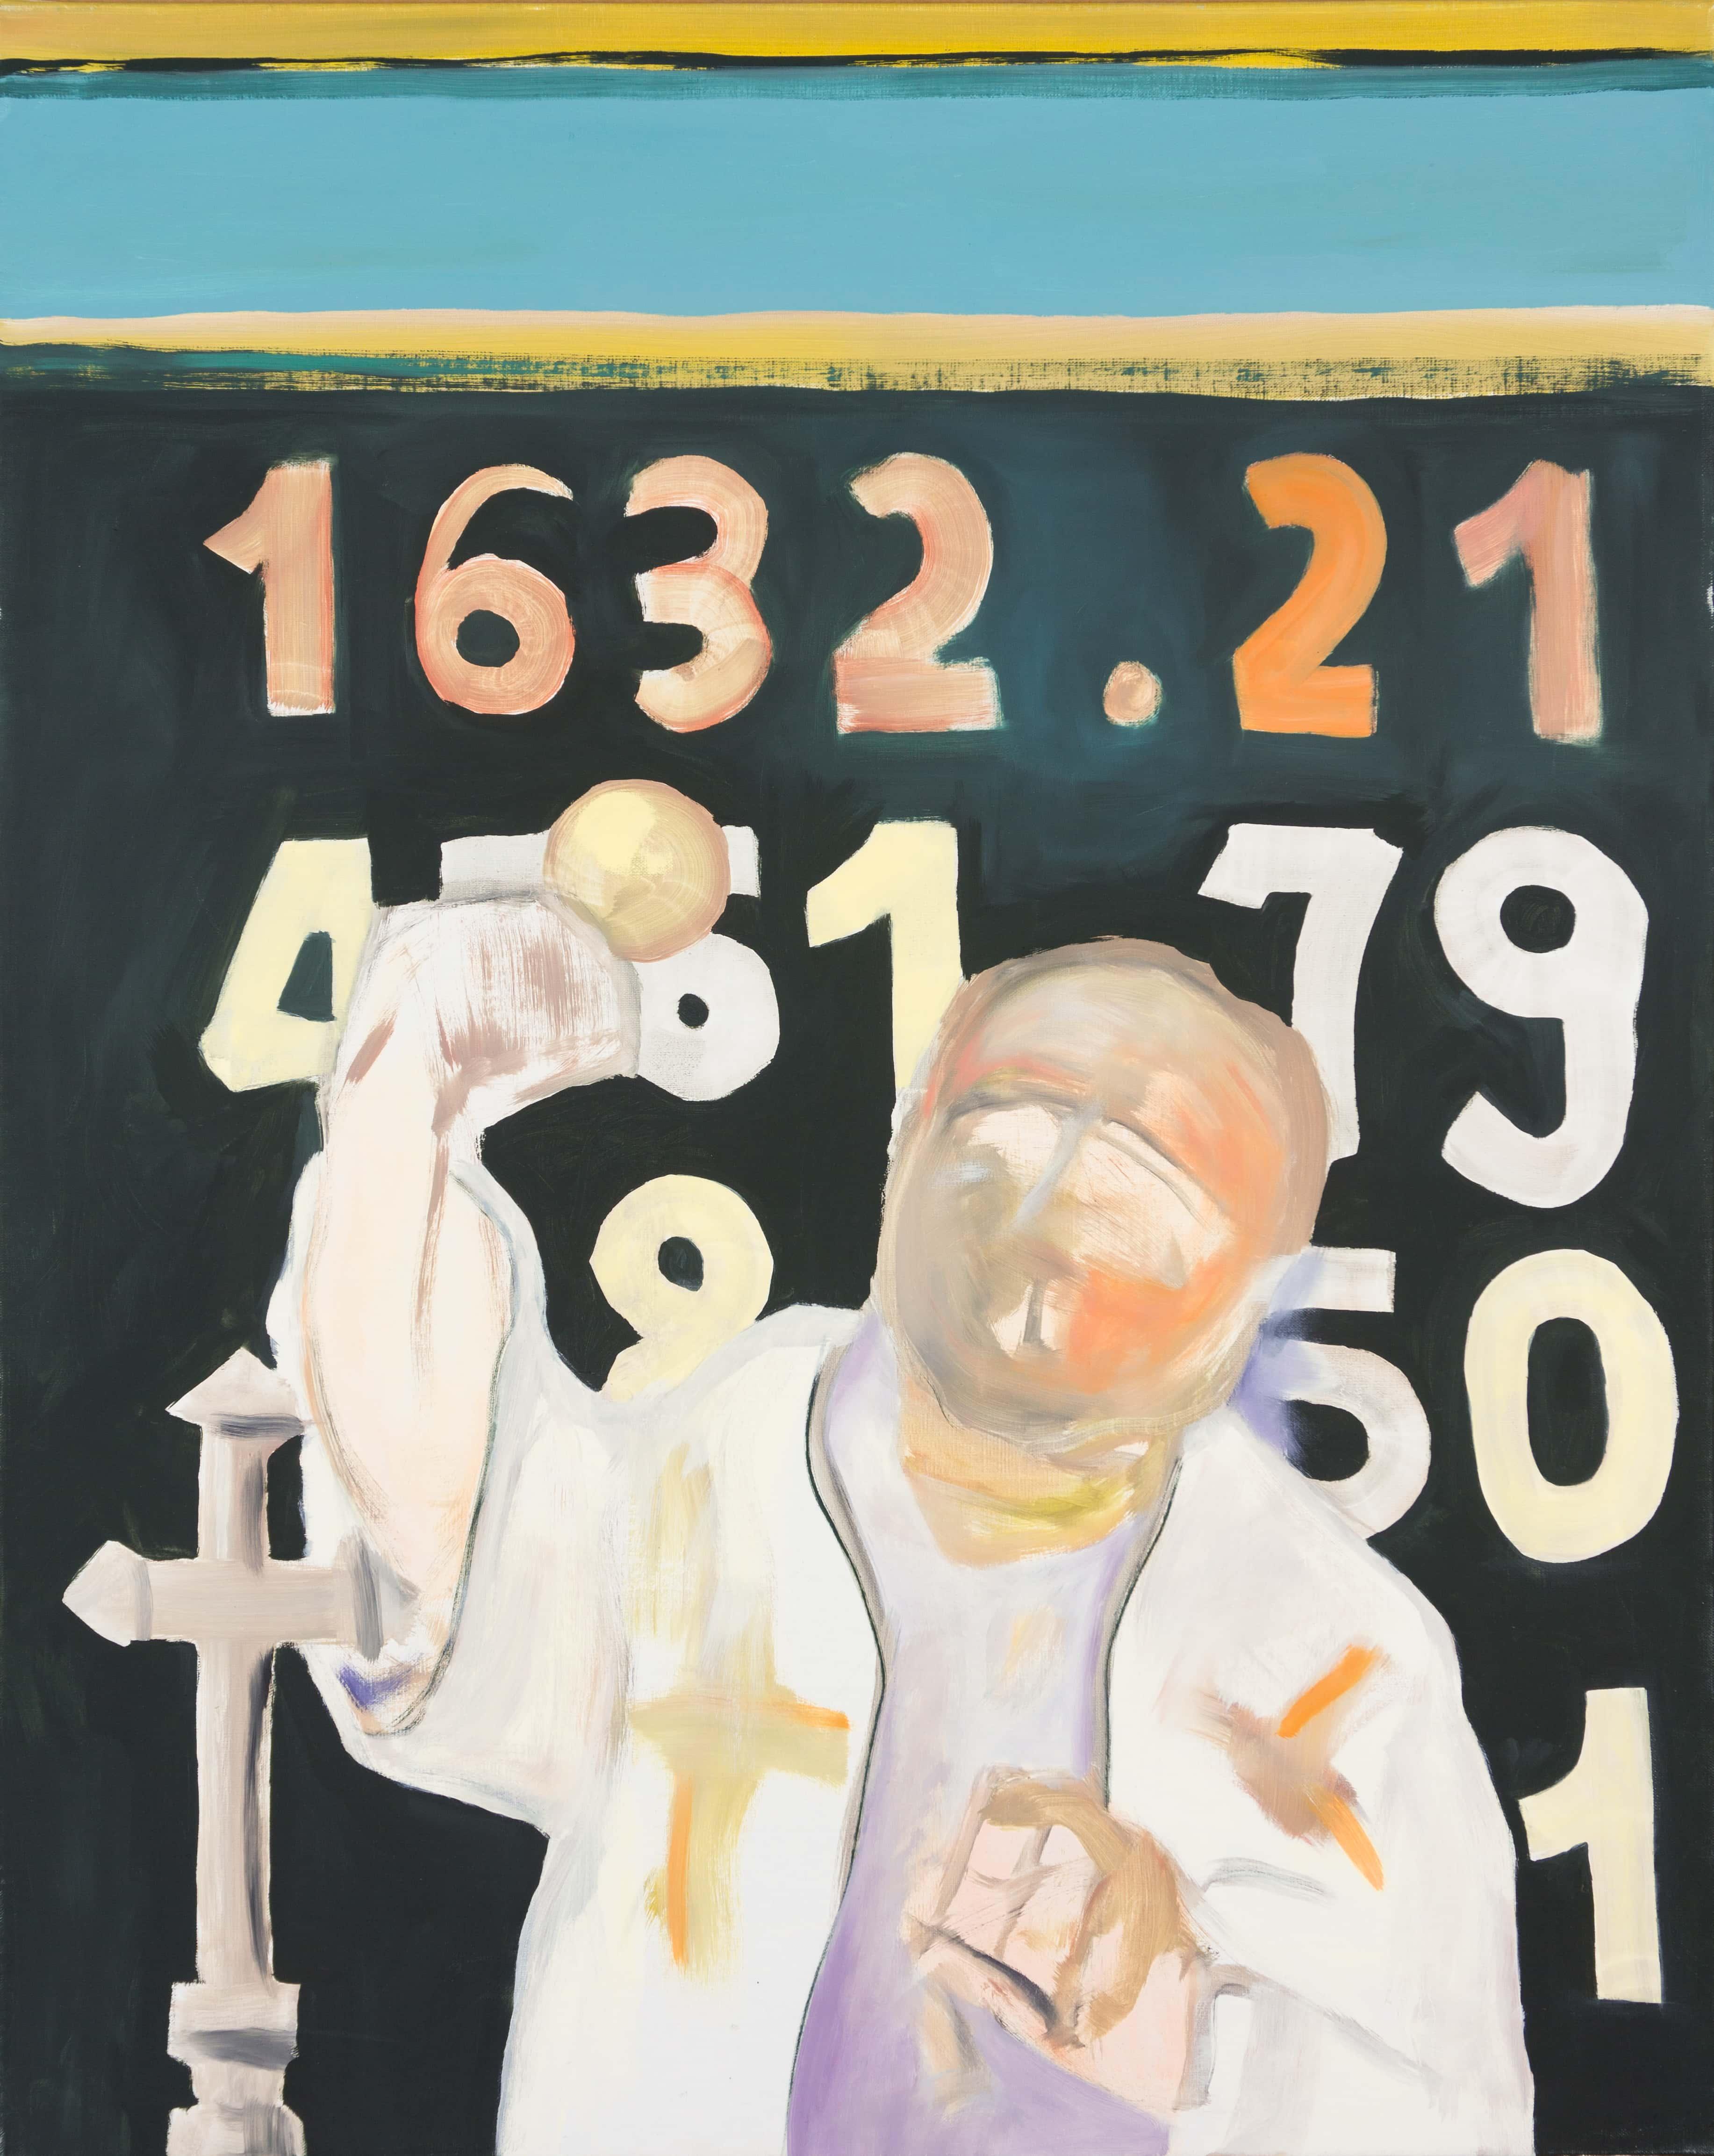 Malerei, Öl auf Leinwand, 80cm x 100cm, Prediger mit geballter Faust, artist: Franziska King